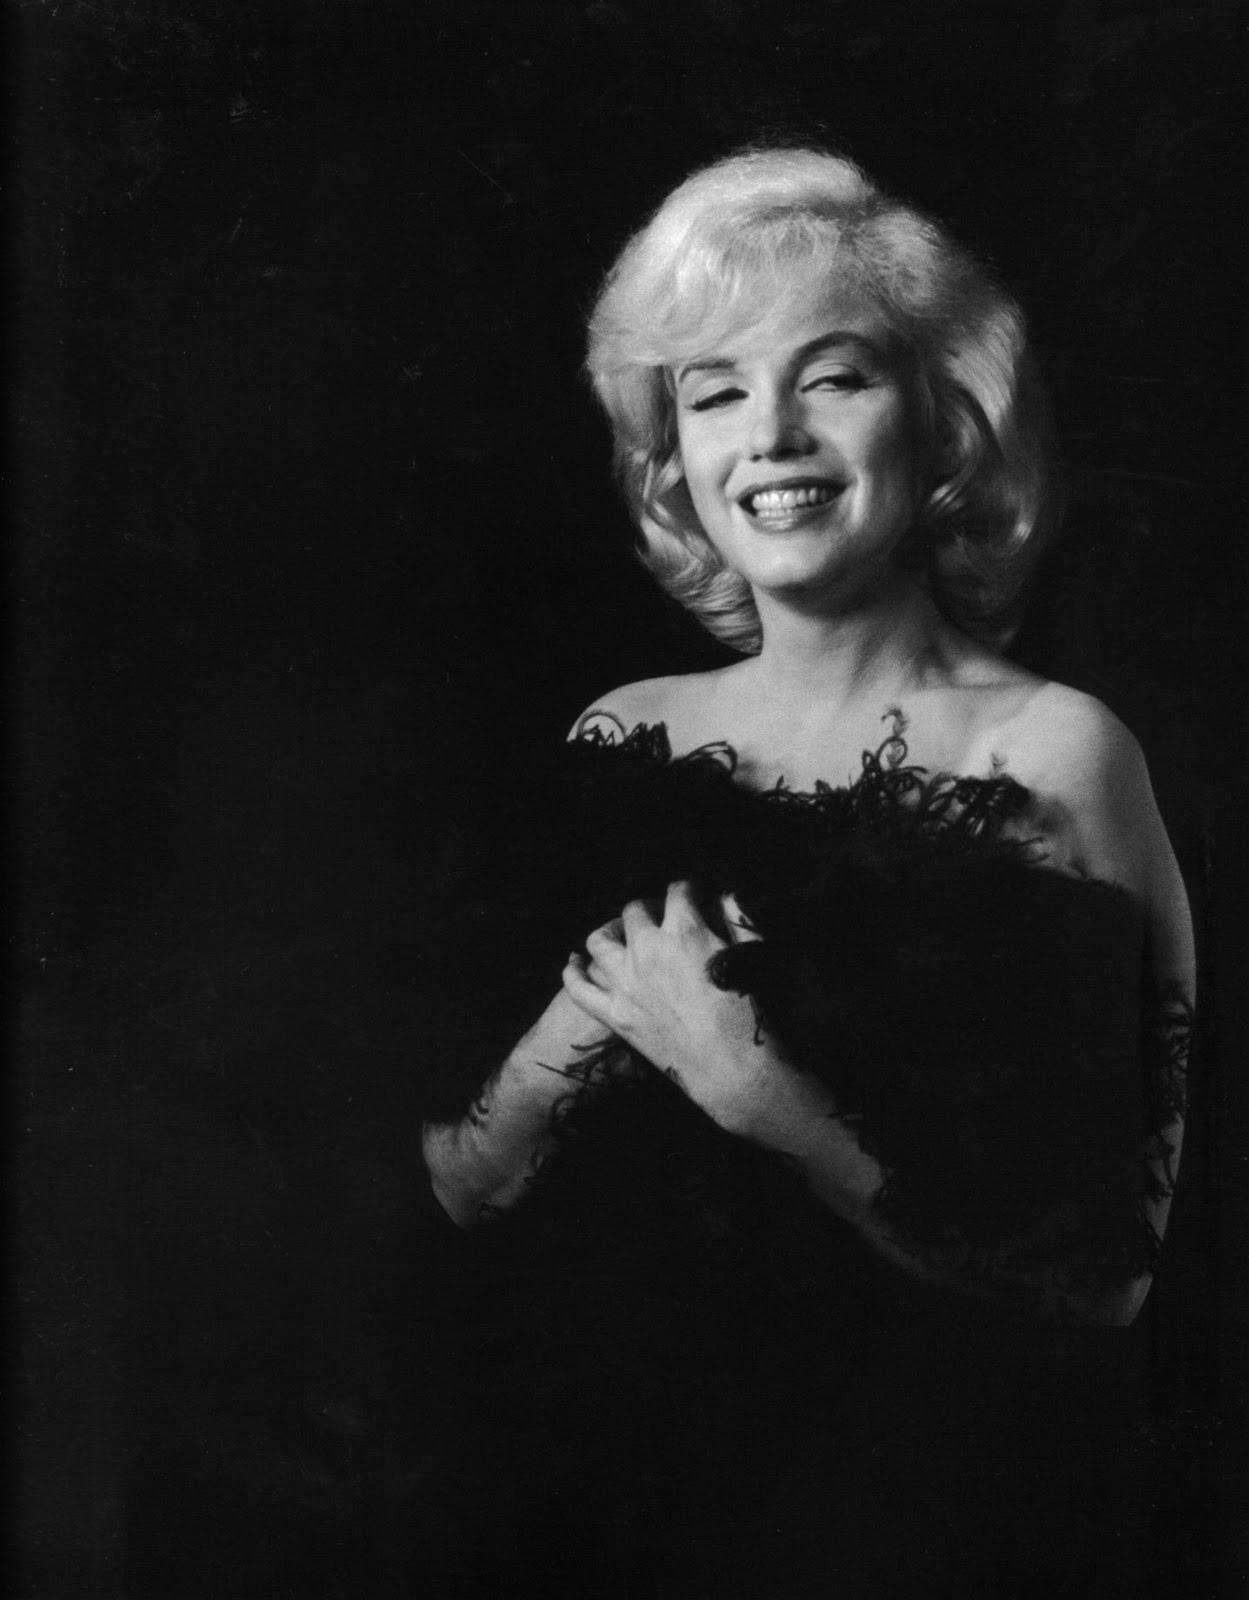 Marilyn Monroe Eve Arnold 41